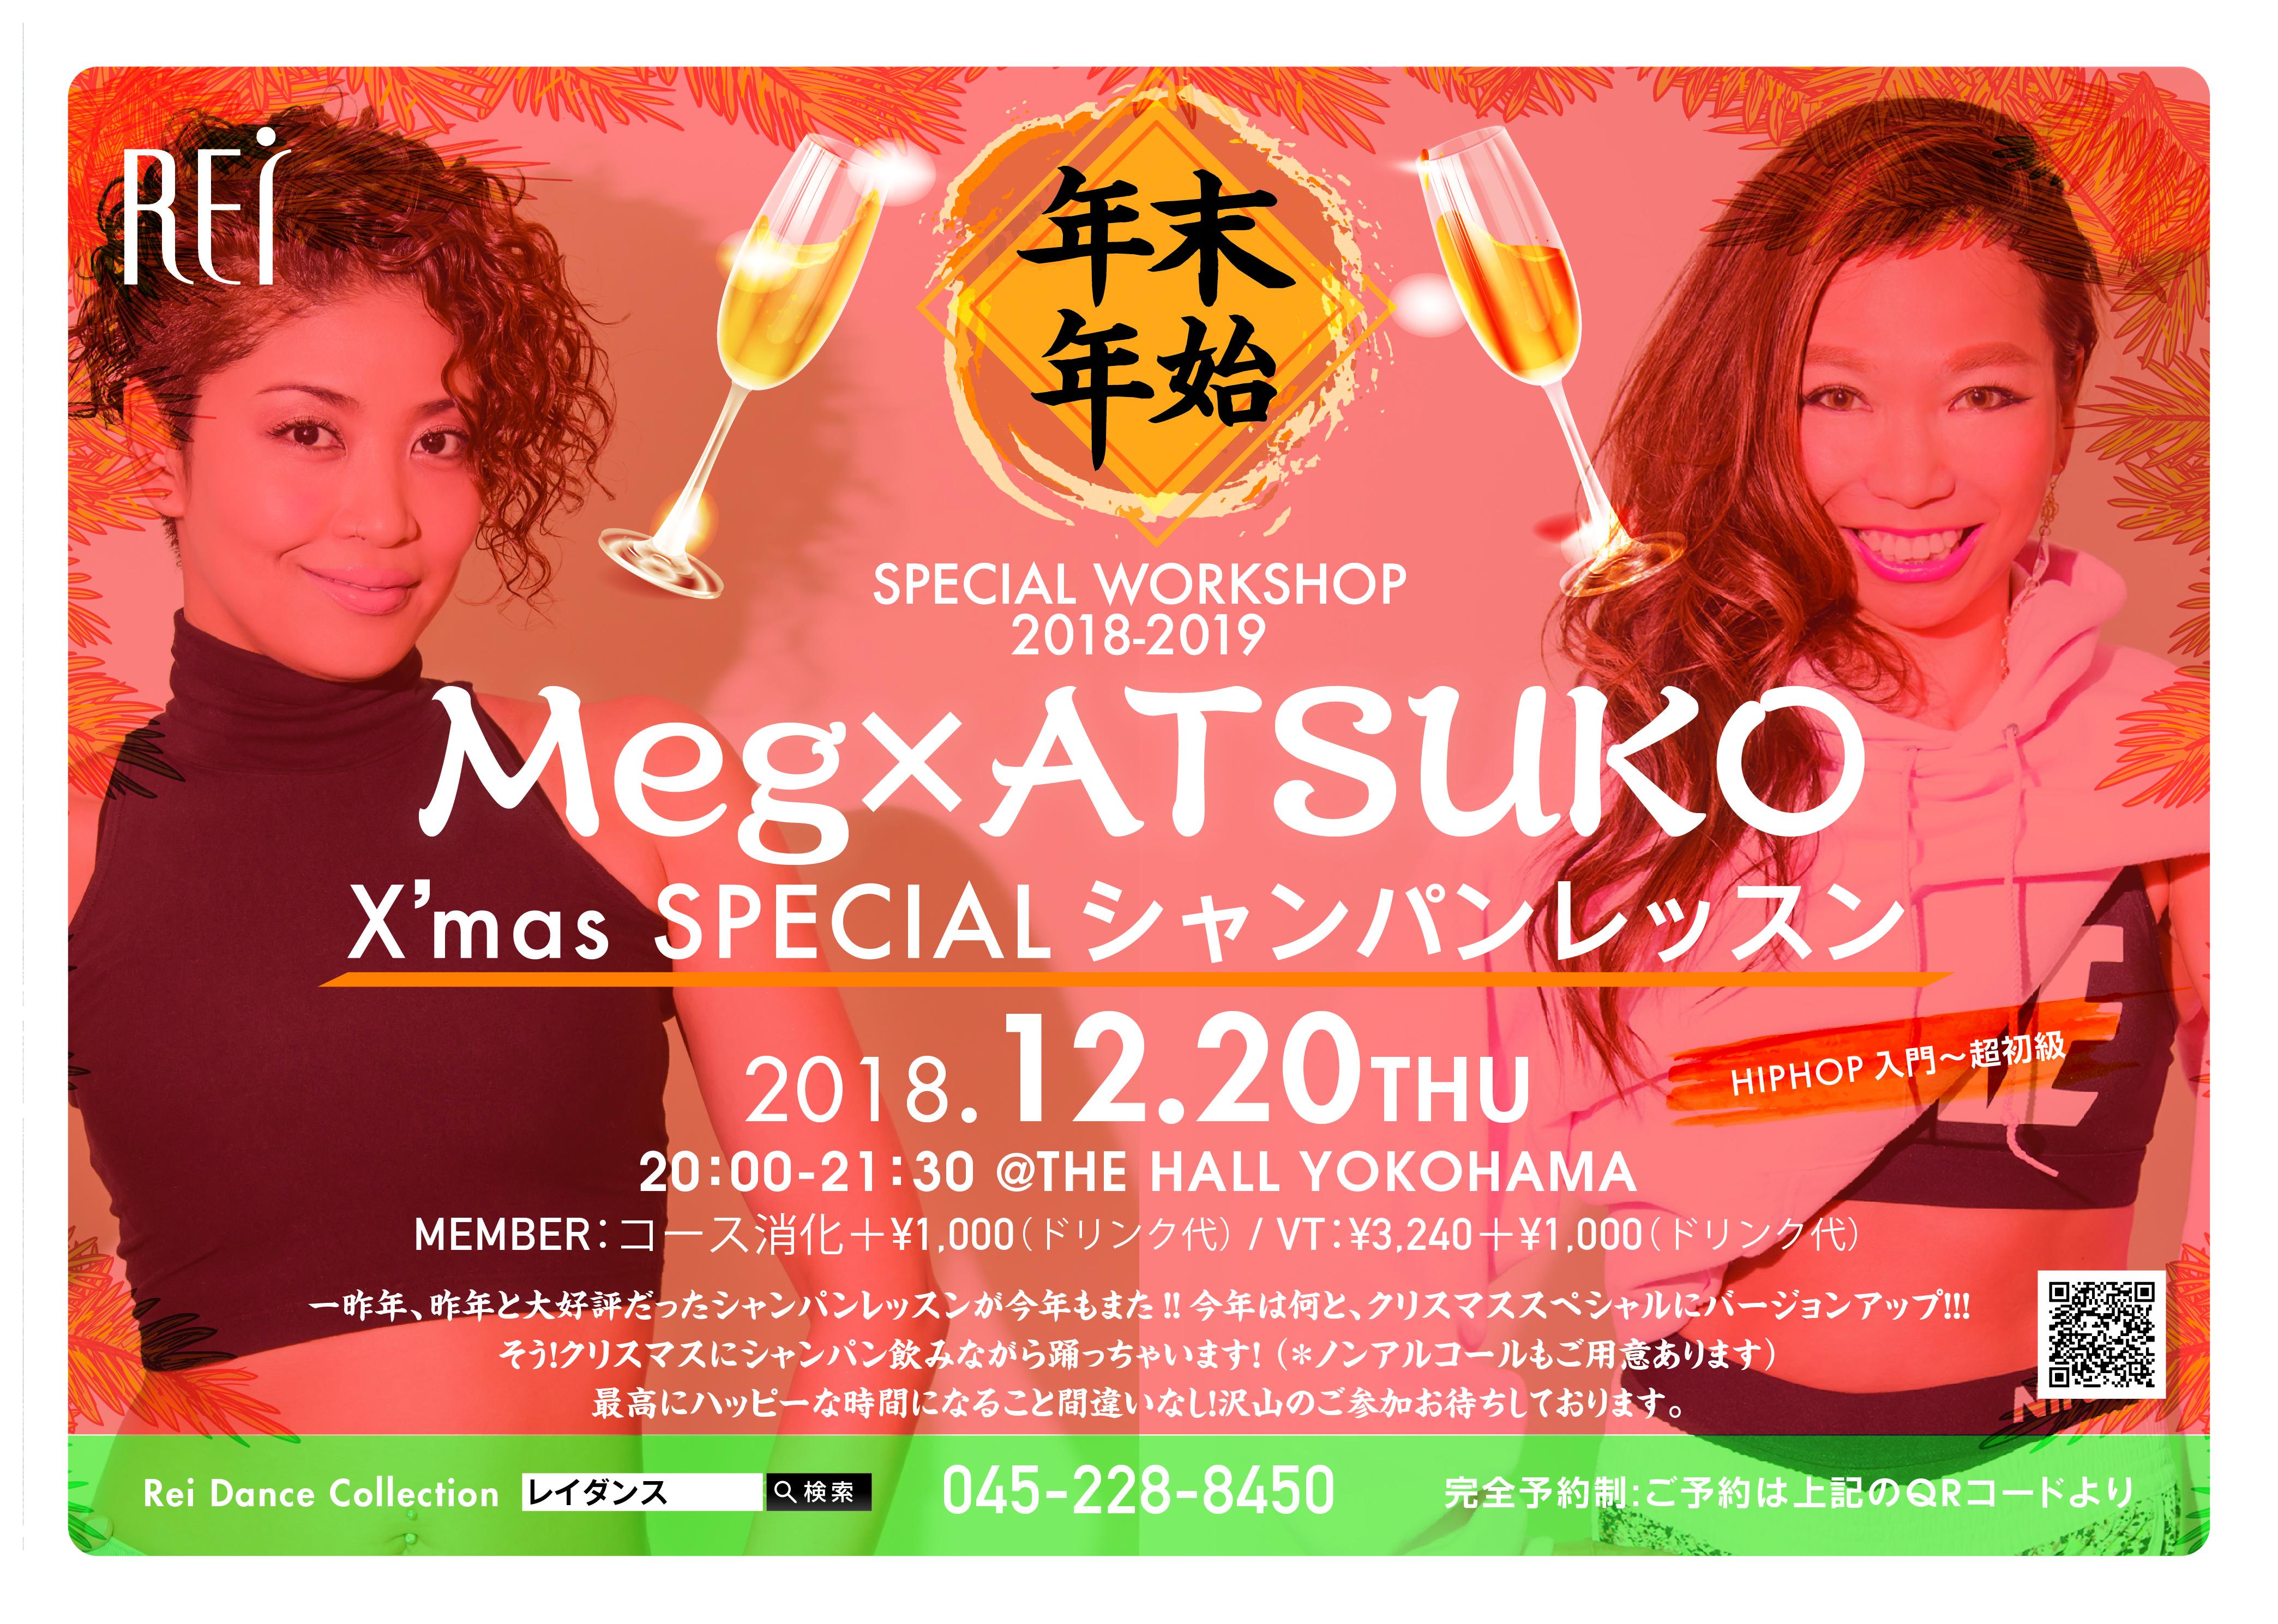 X'masにシャンパン飲みながら踊っちゃおう!!Meg×ATSUKO SPECIALレッスン開催決定!!